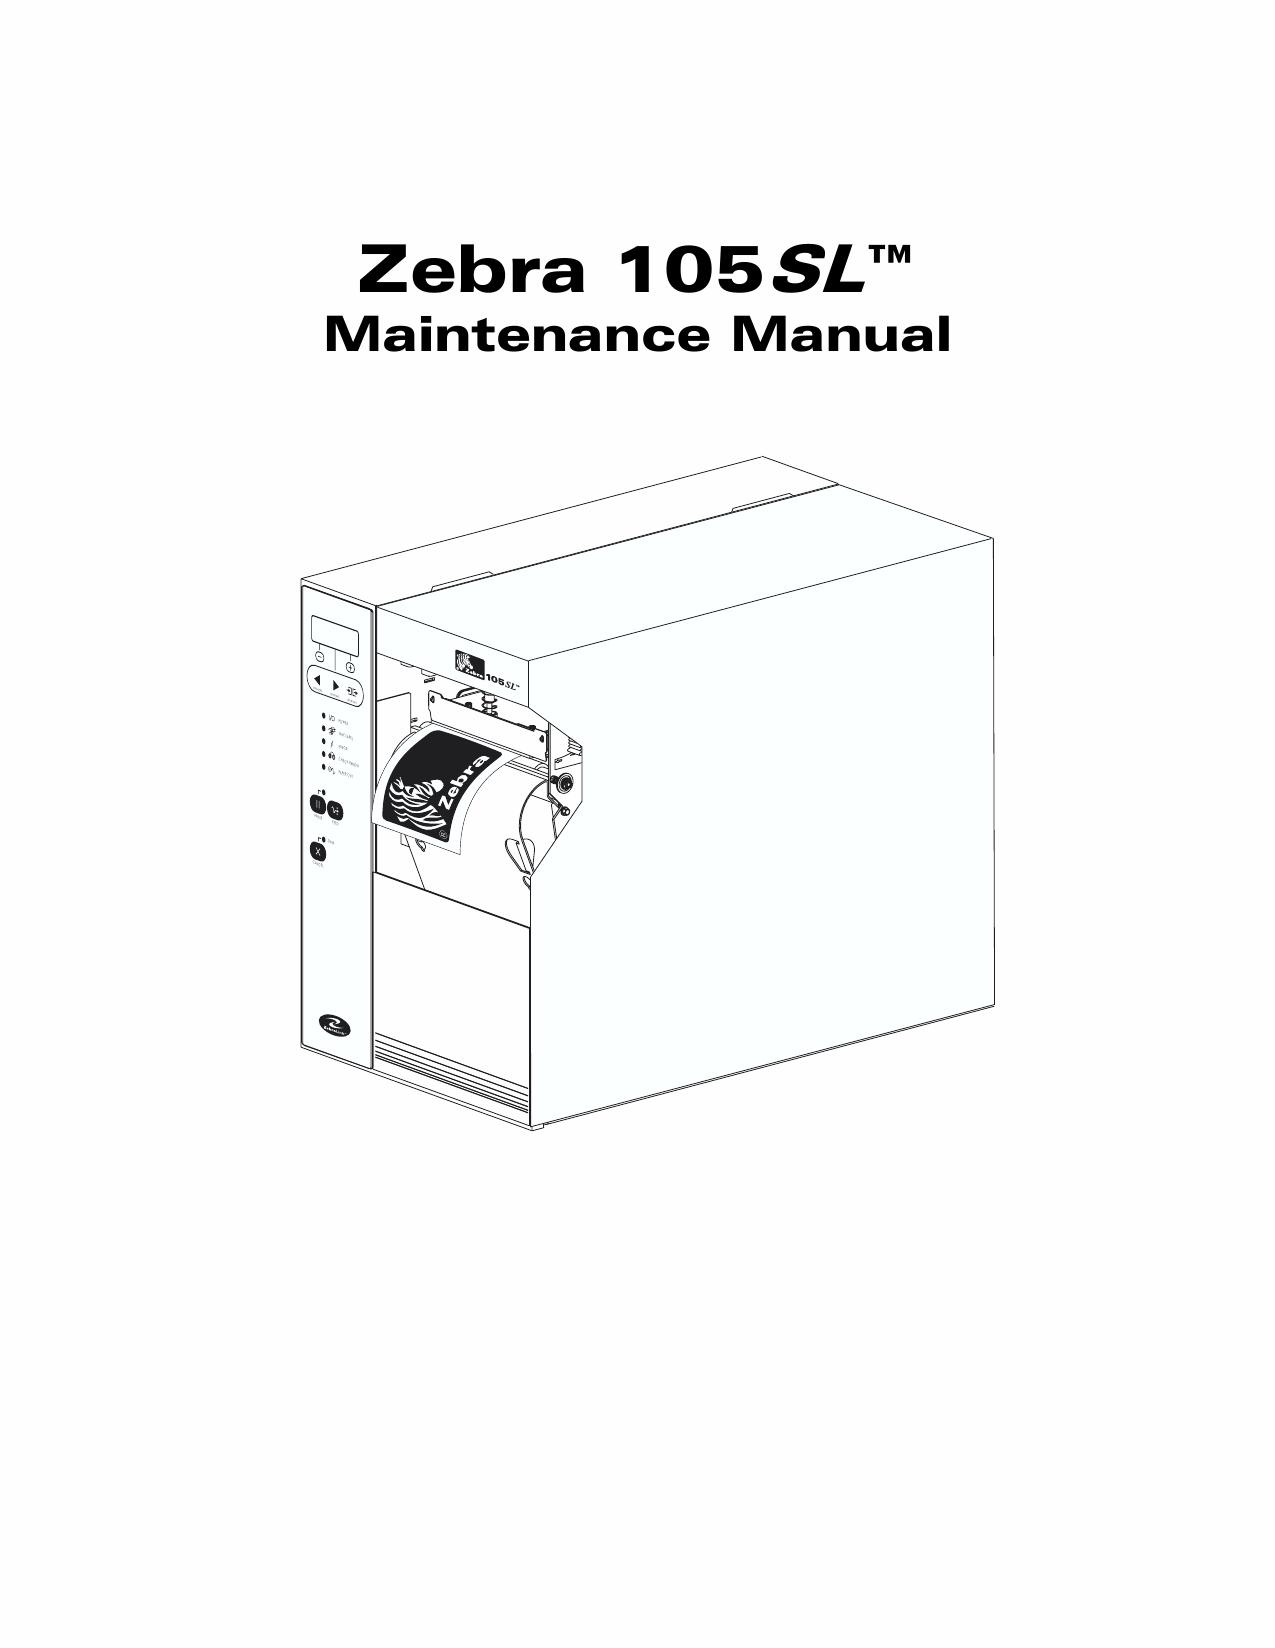 Zebra Printers Manual